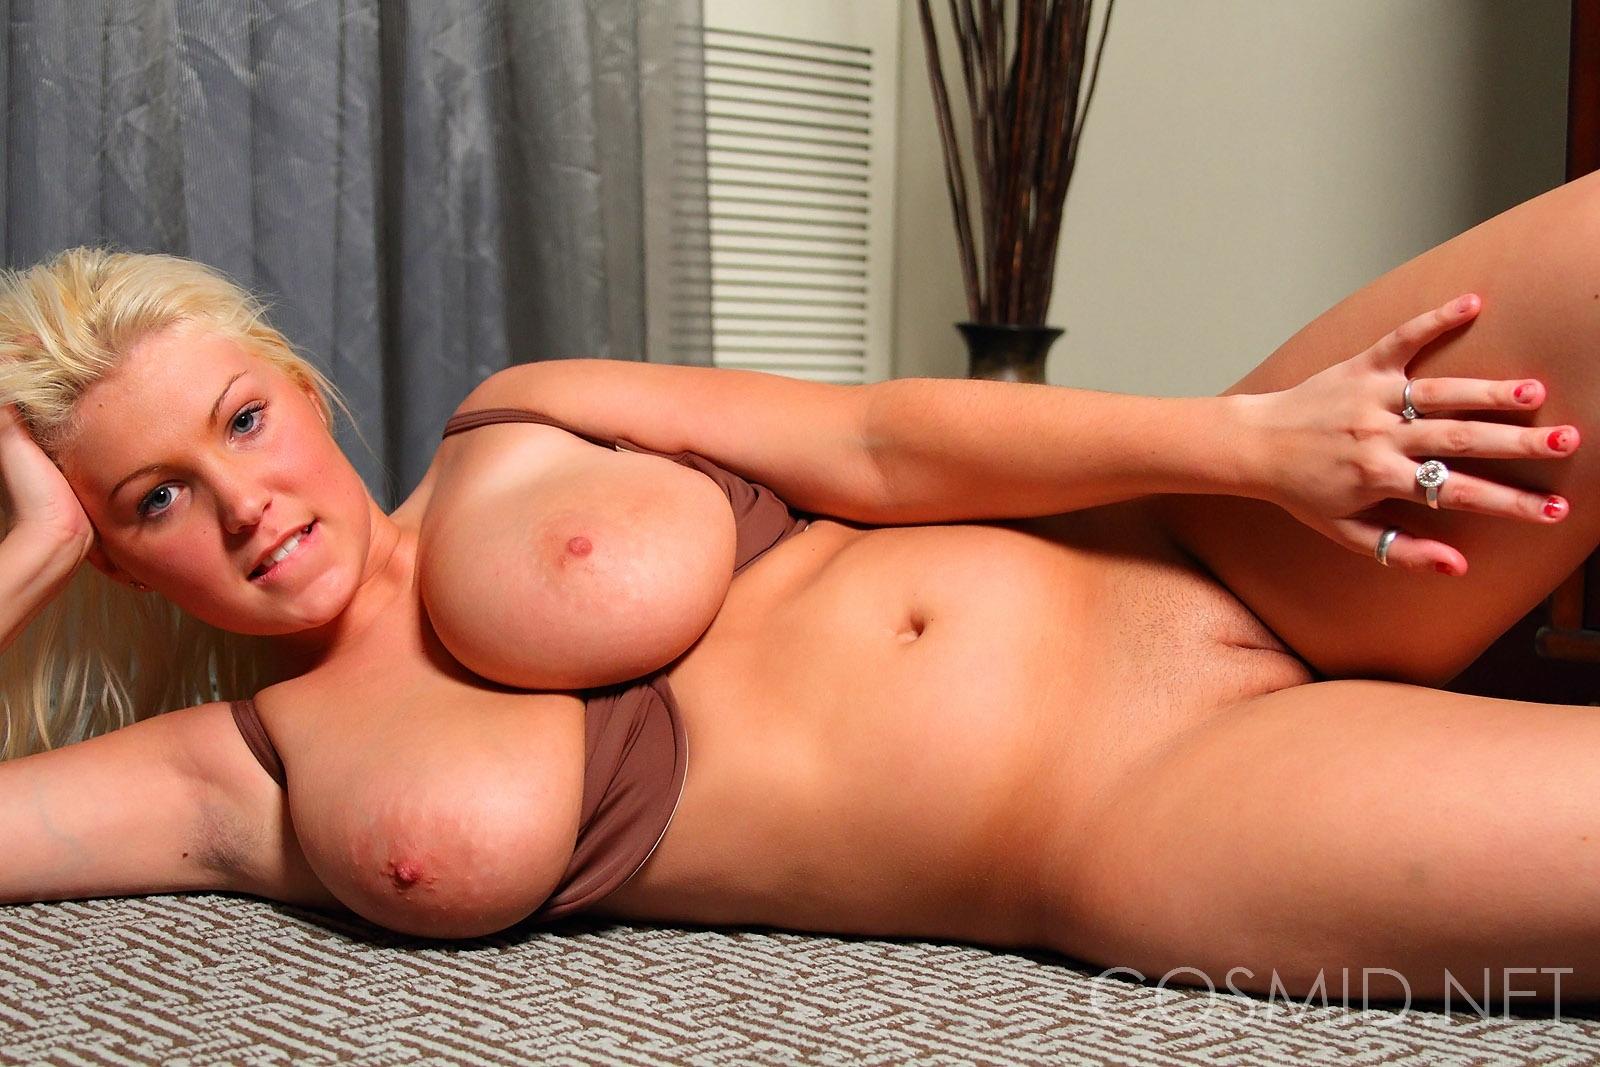 Brooke alexander cosmid pussy